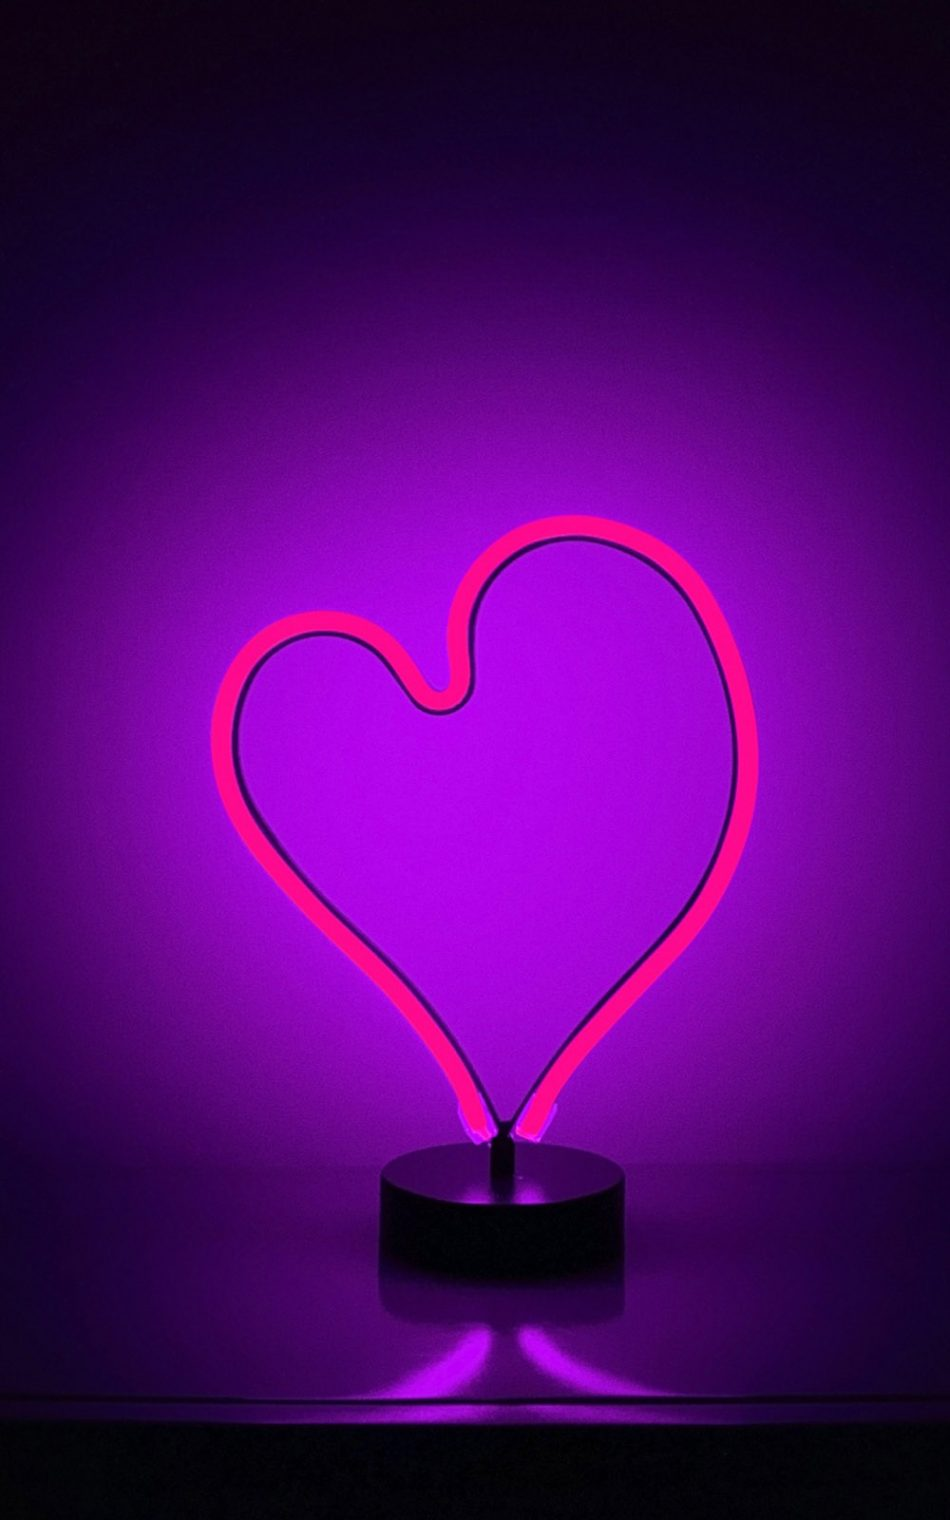 Download heart shape neon backlight free pure 4k ultra hd - Neon hd wallpaper for mobile ...